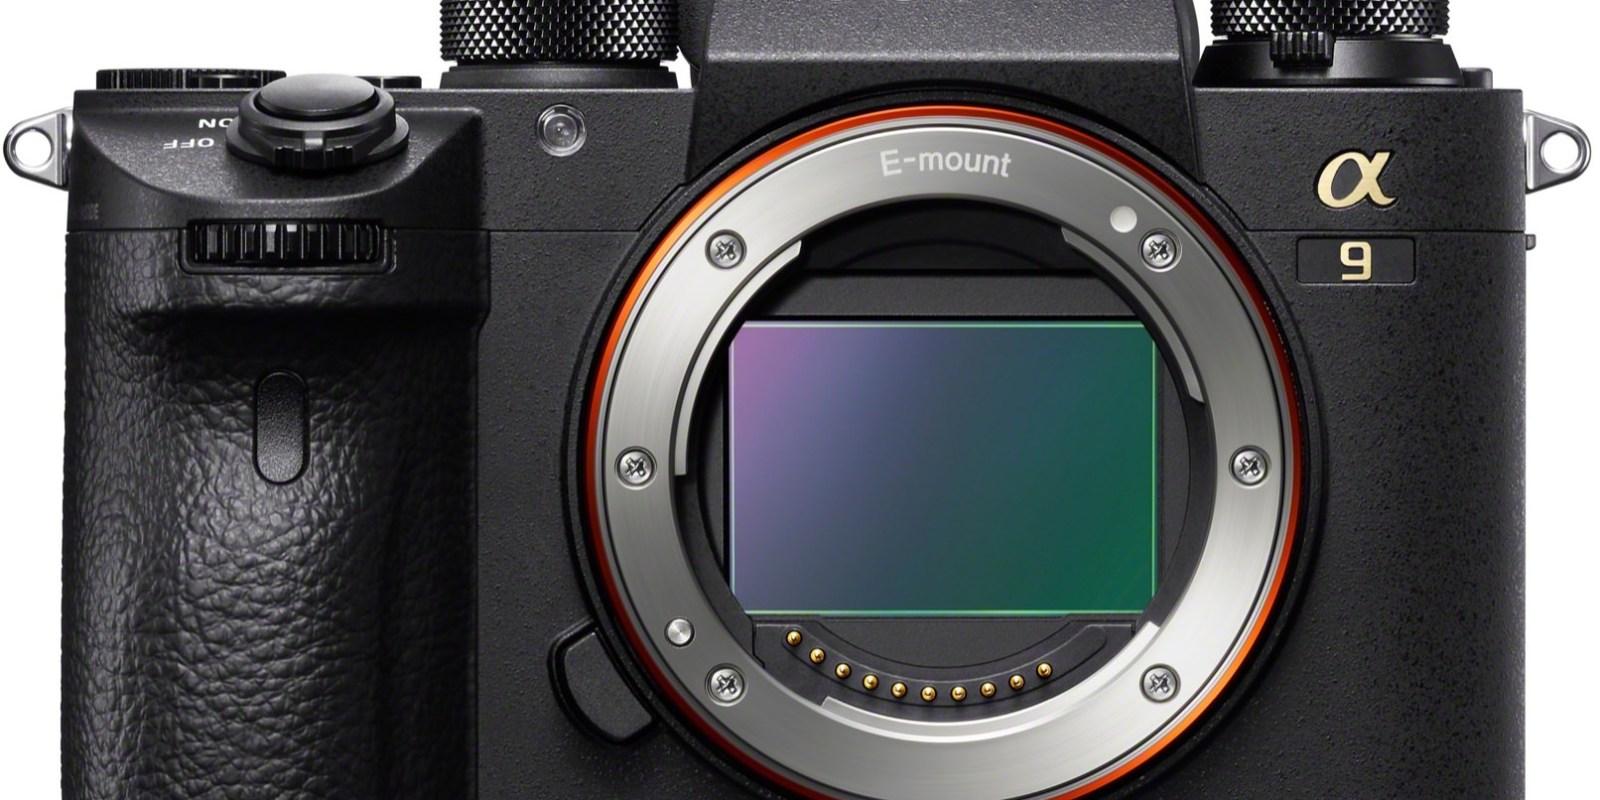 SONY 旗艦機種 A9 主打運動題材 2400萬畫素、693個自動對焦點、每秒20張連拍